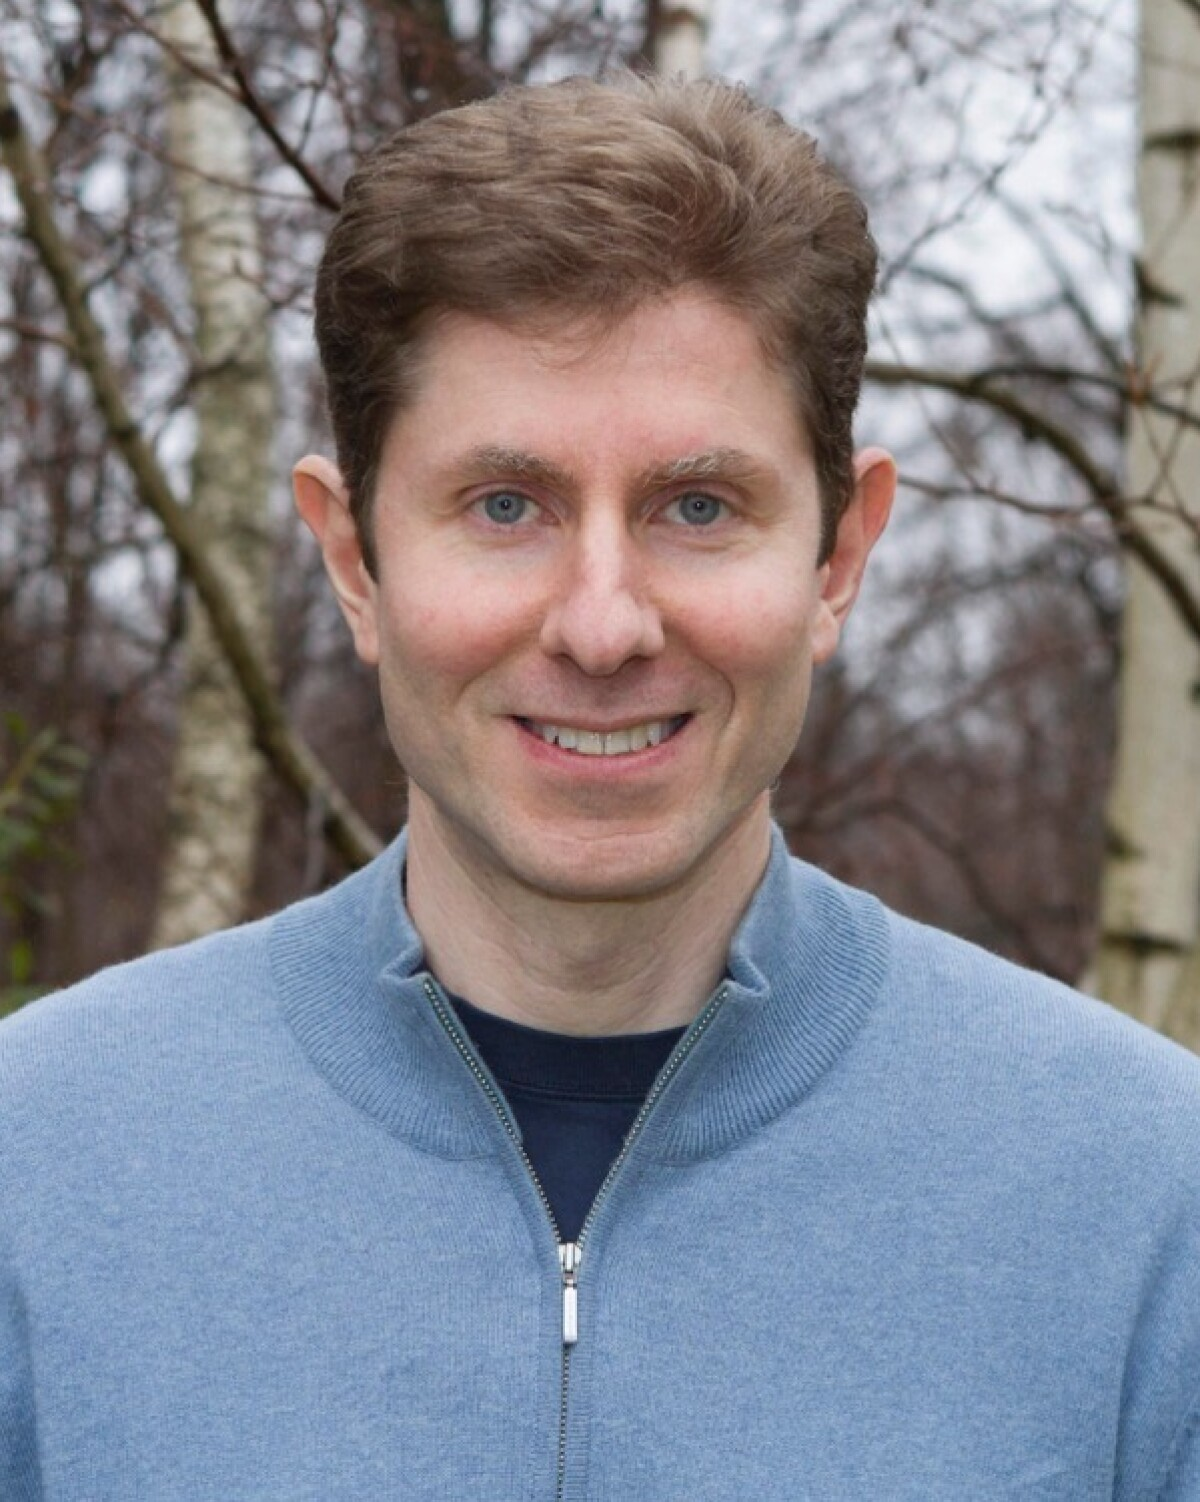 Spyros Matsoukas, Senior Principal Applied Scientist, Alexa AI